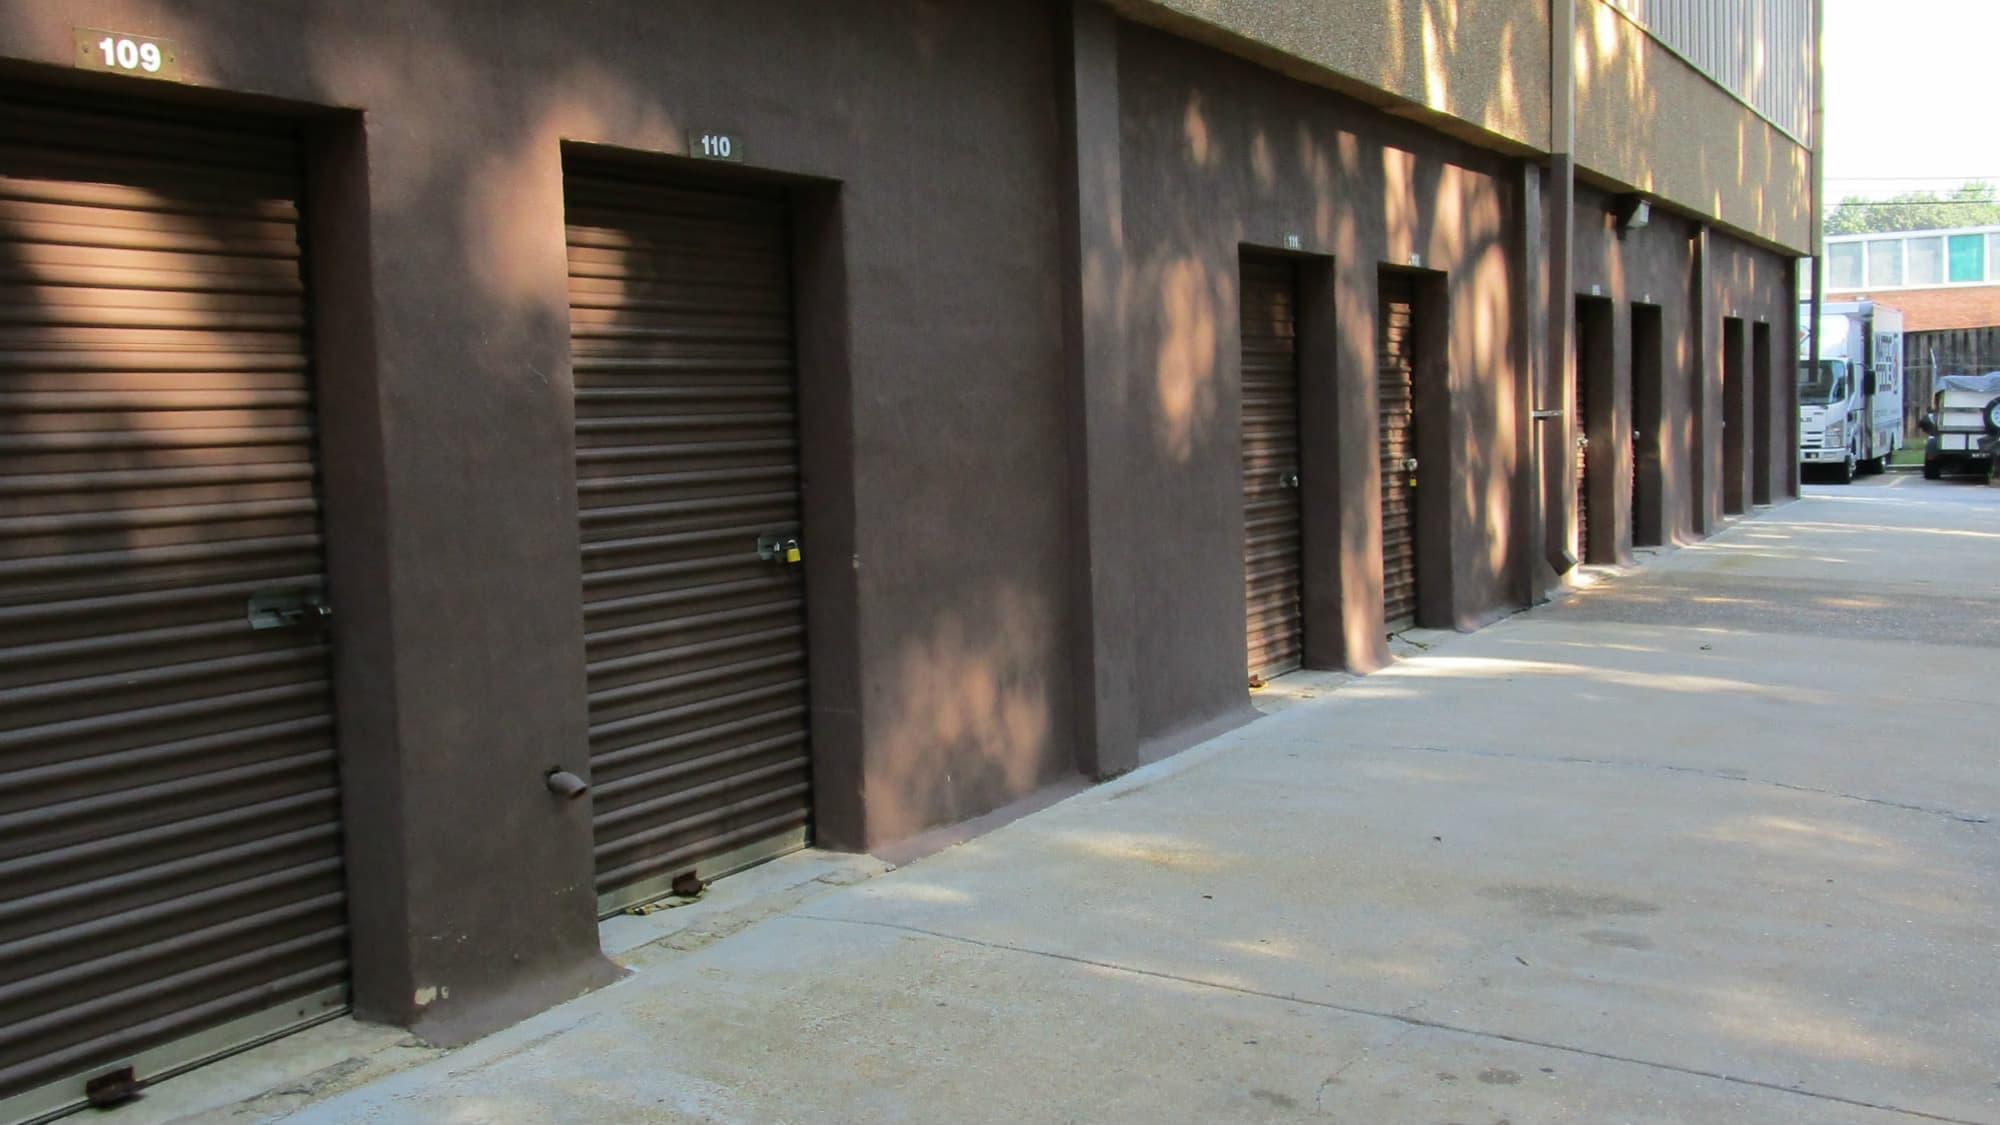 Ground-floor units at Self Storage Plus in Lanham, MD